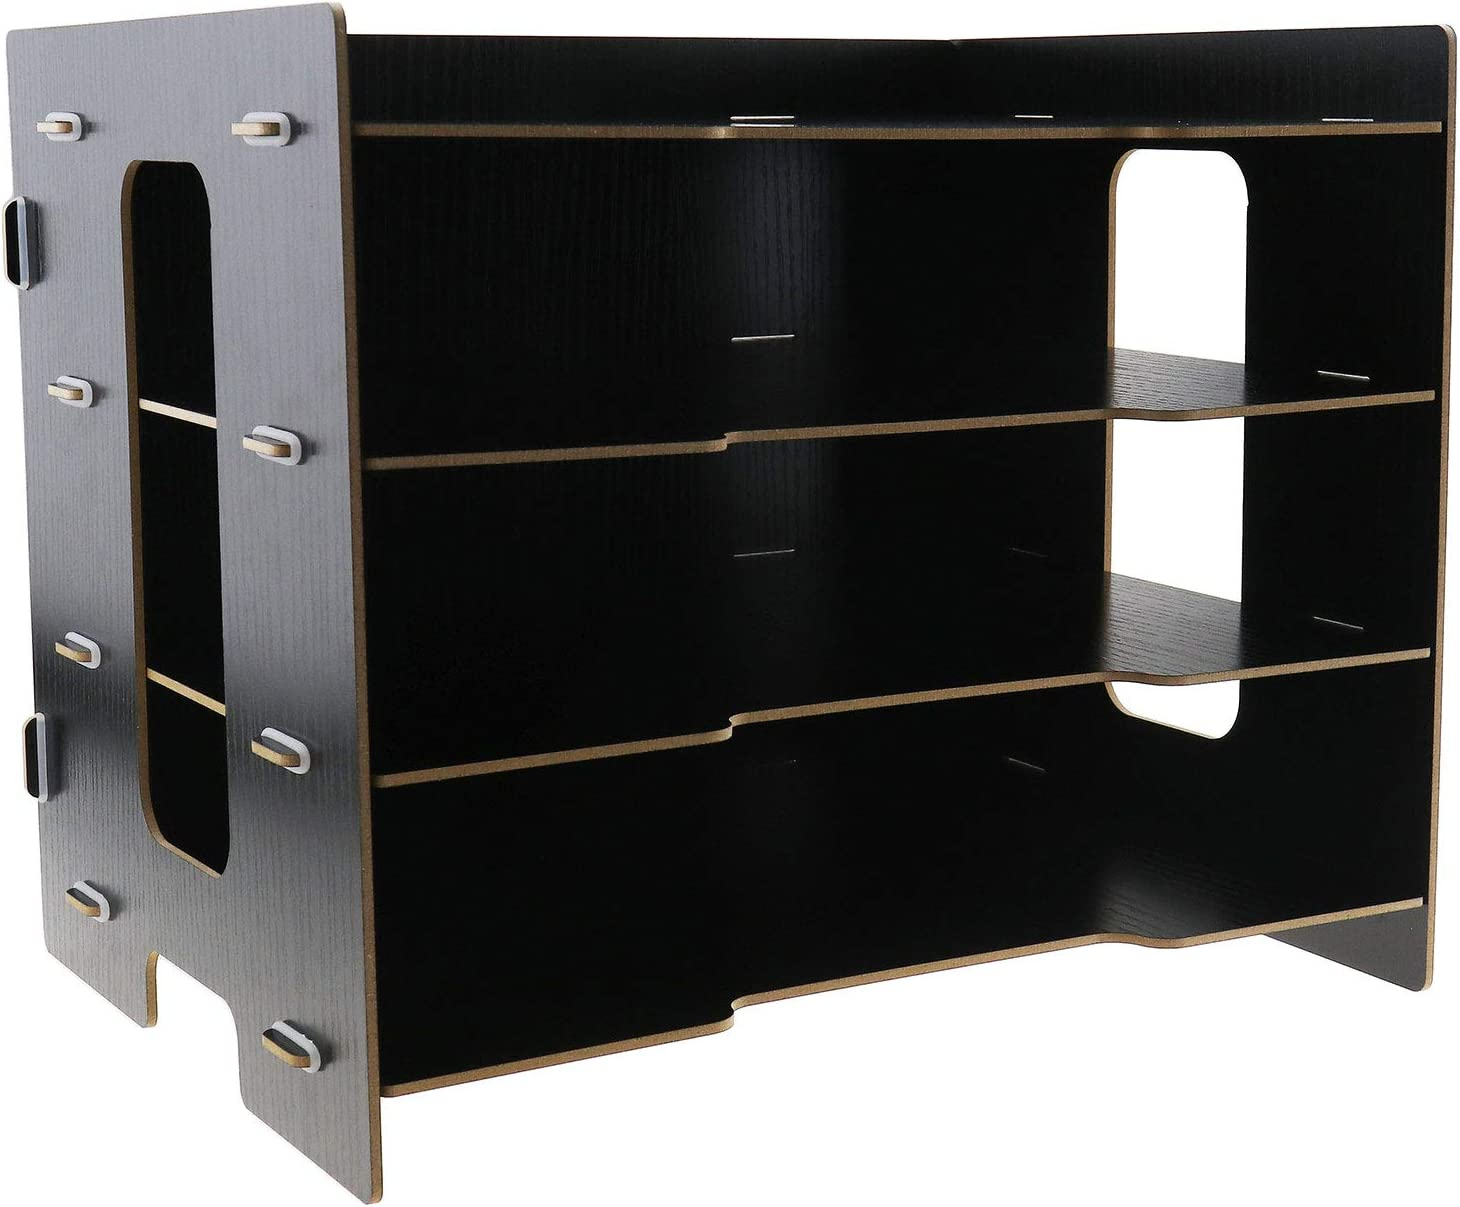 Desktop File Sorter Organizer, 33x27x24cm Wooden Tray Office Home School Office Home School -Black